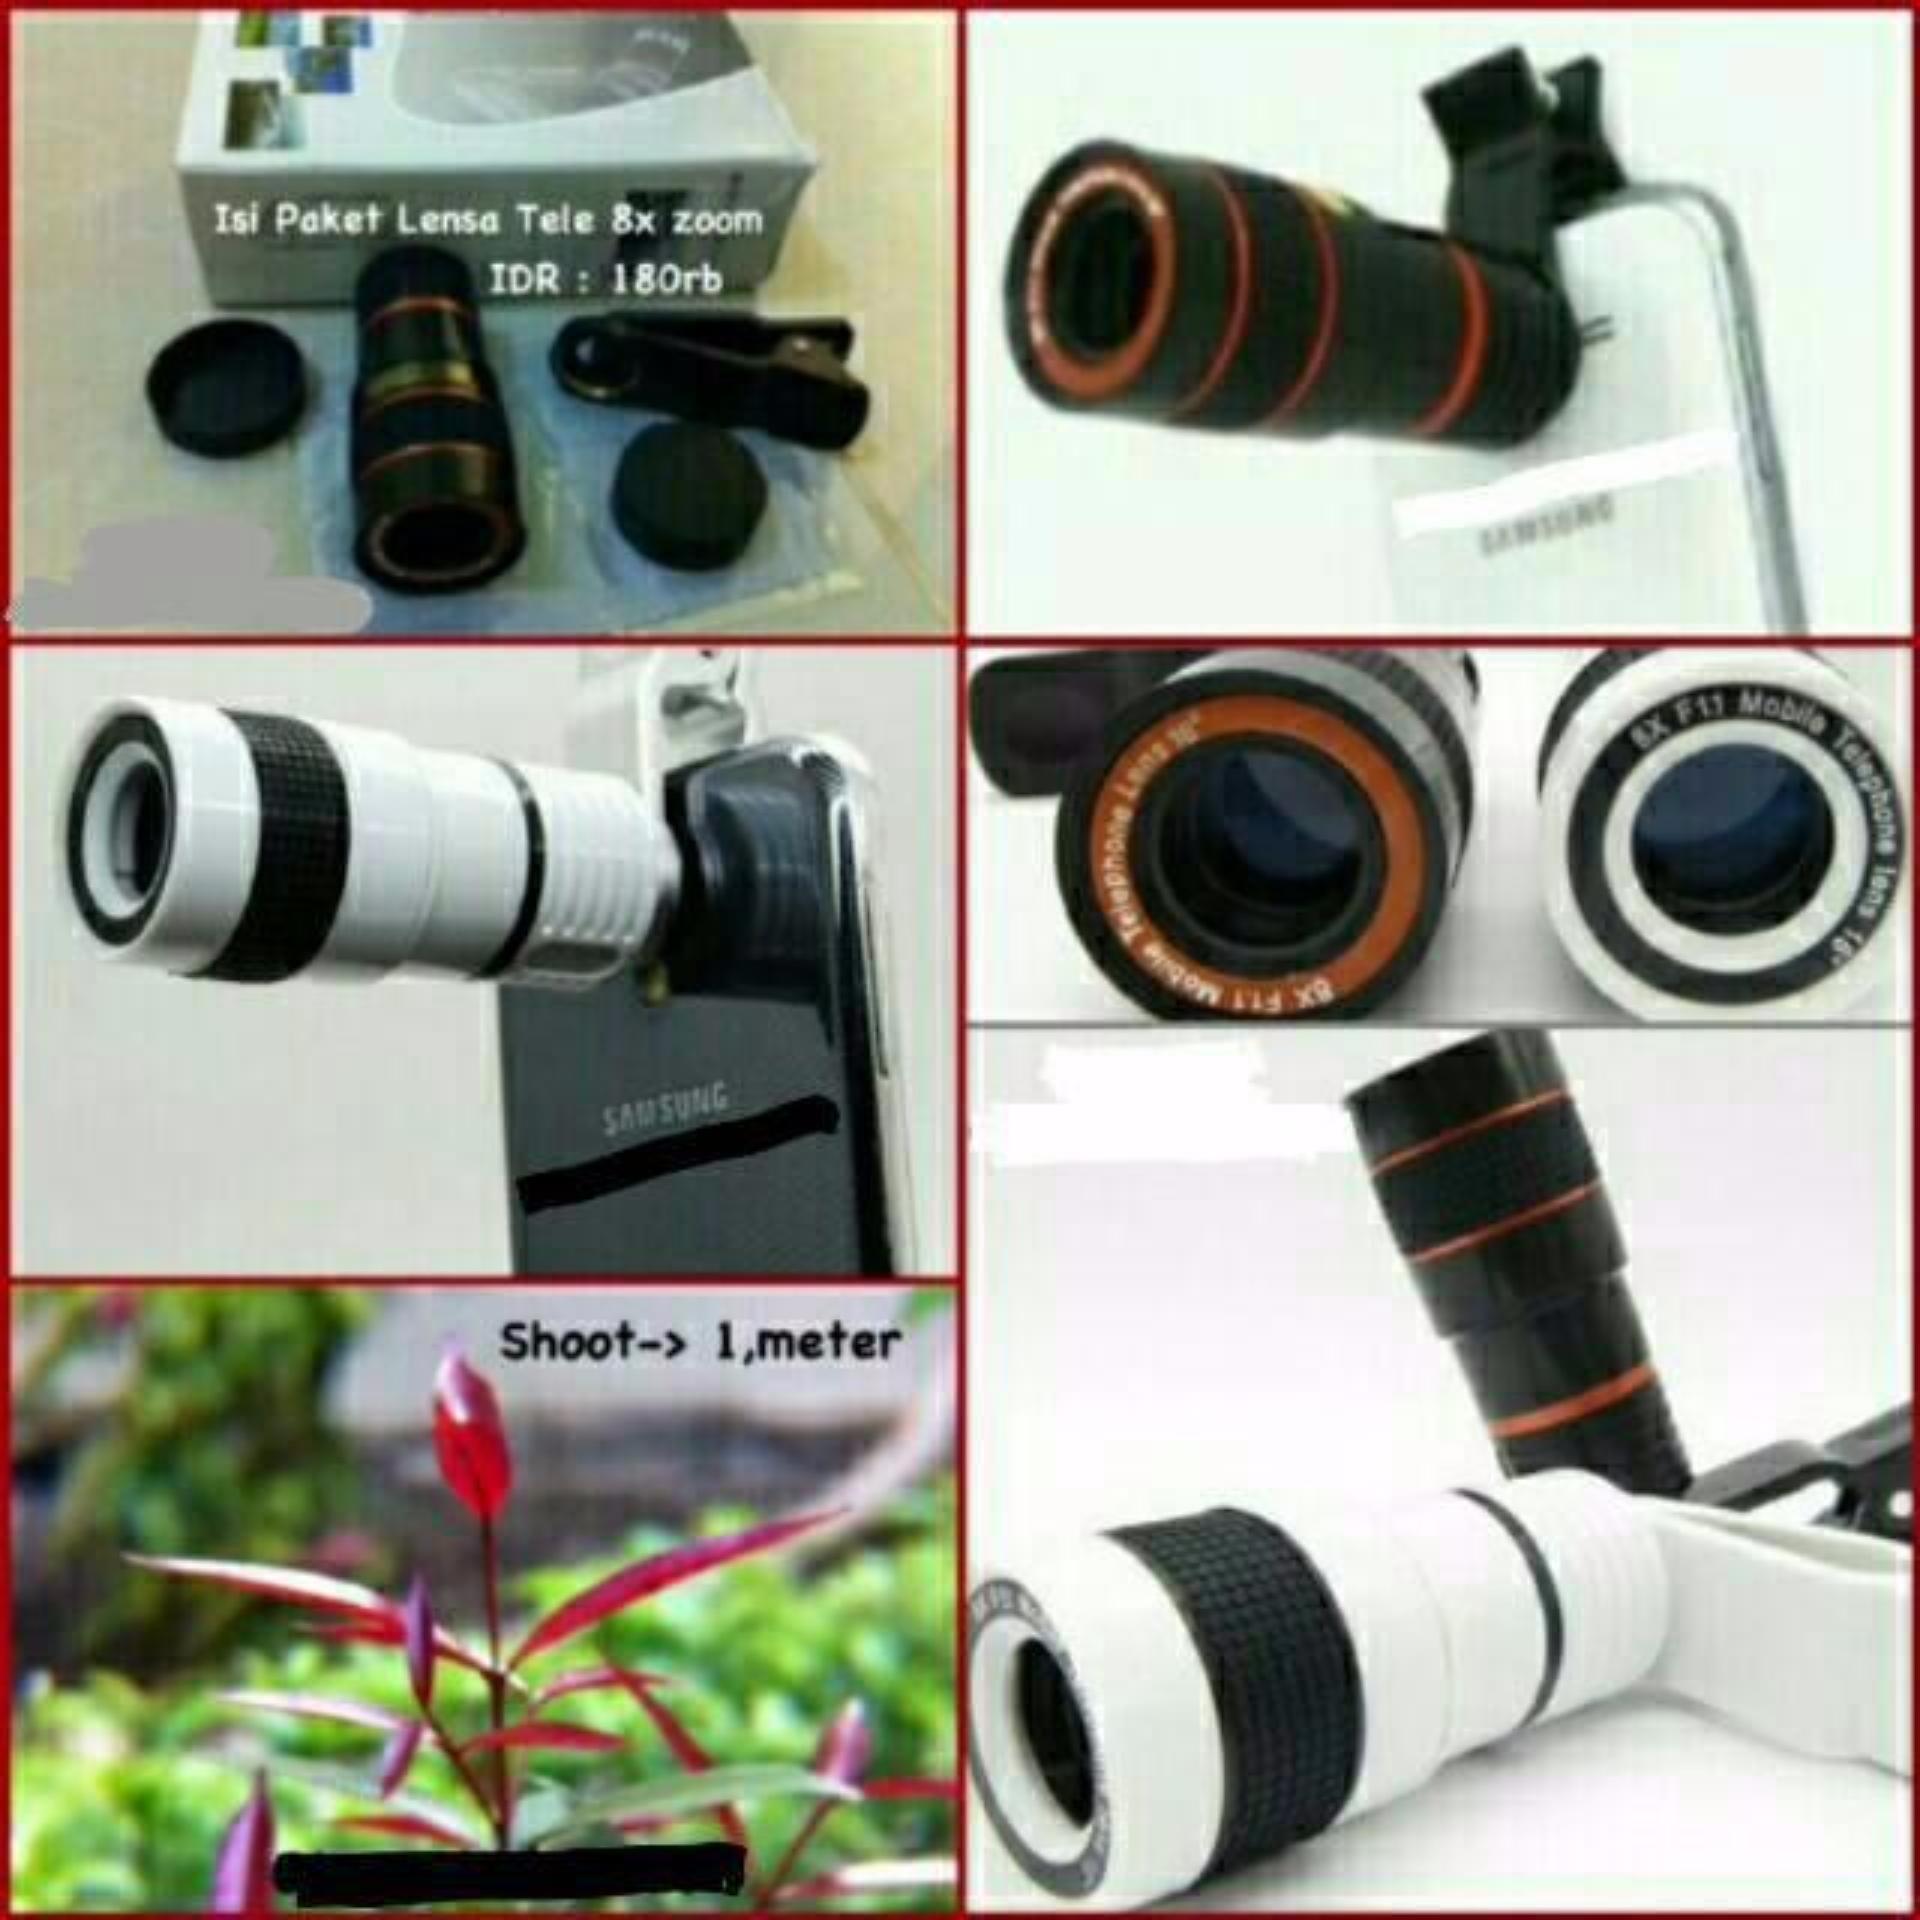 Pencari Harga Universal Camera Lensa Telezoom 8x Jepit Telescope For All Type Hp